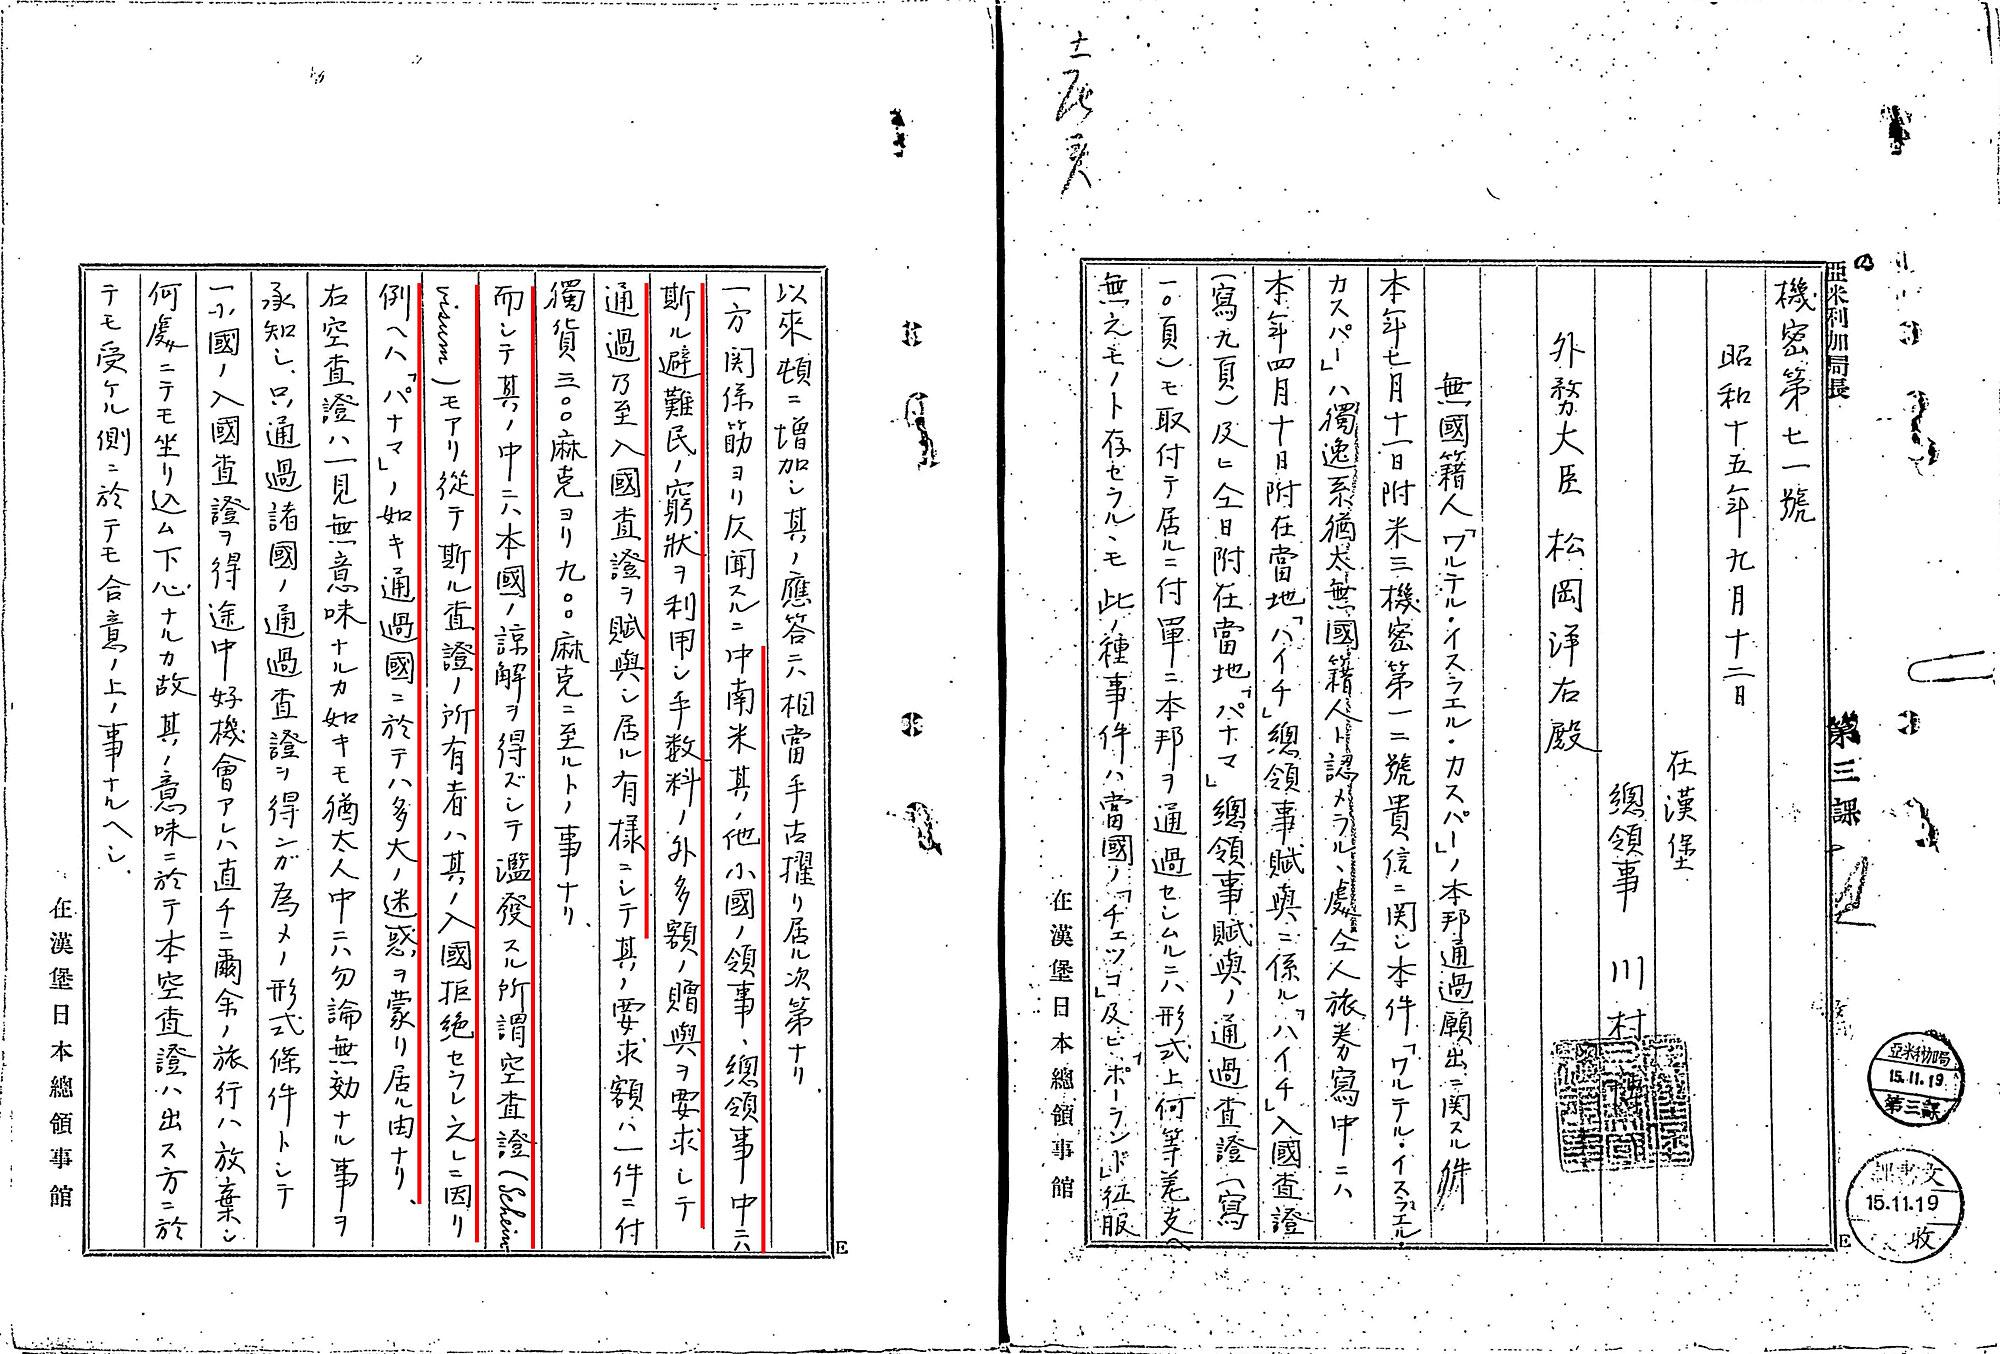 https://www.jacar.go.jp/modernjapan/images/p14/p08L.jpg